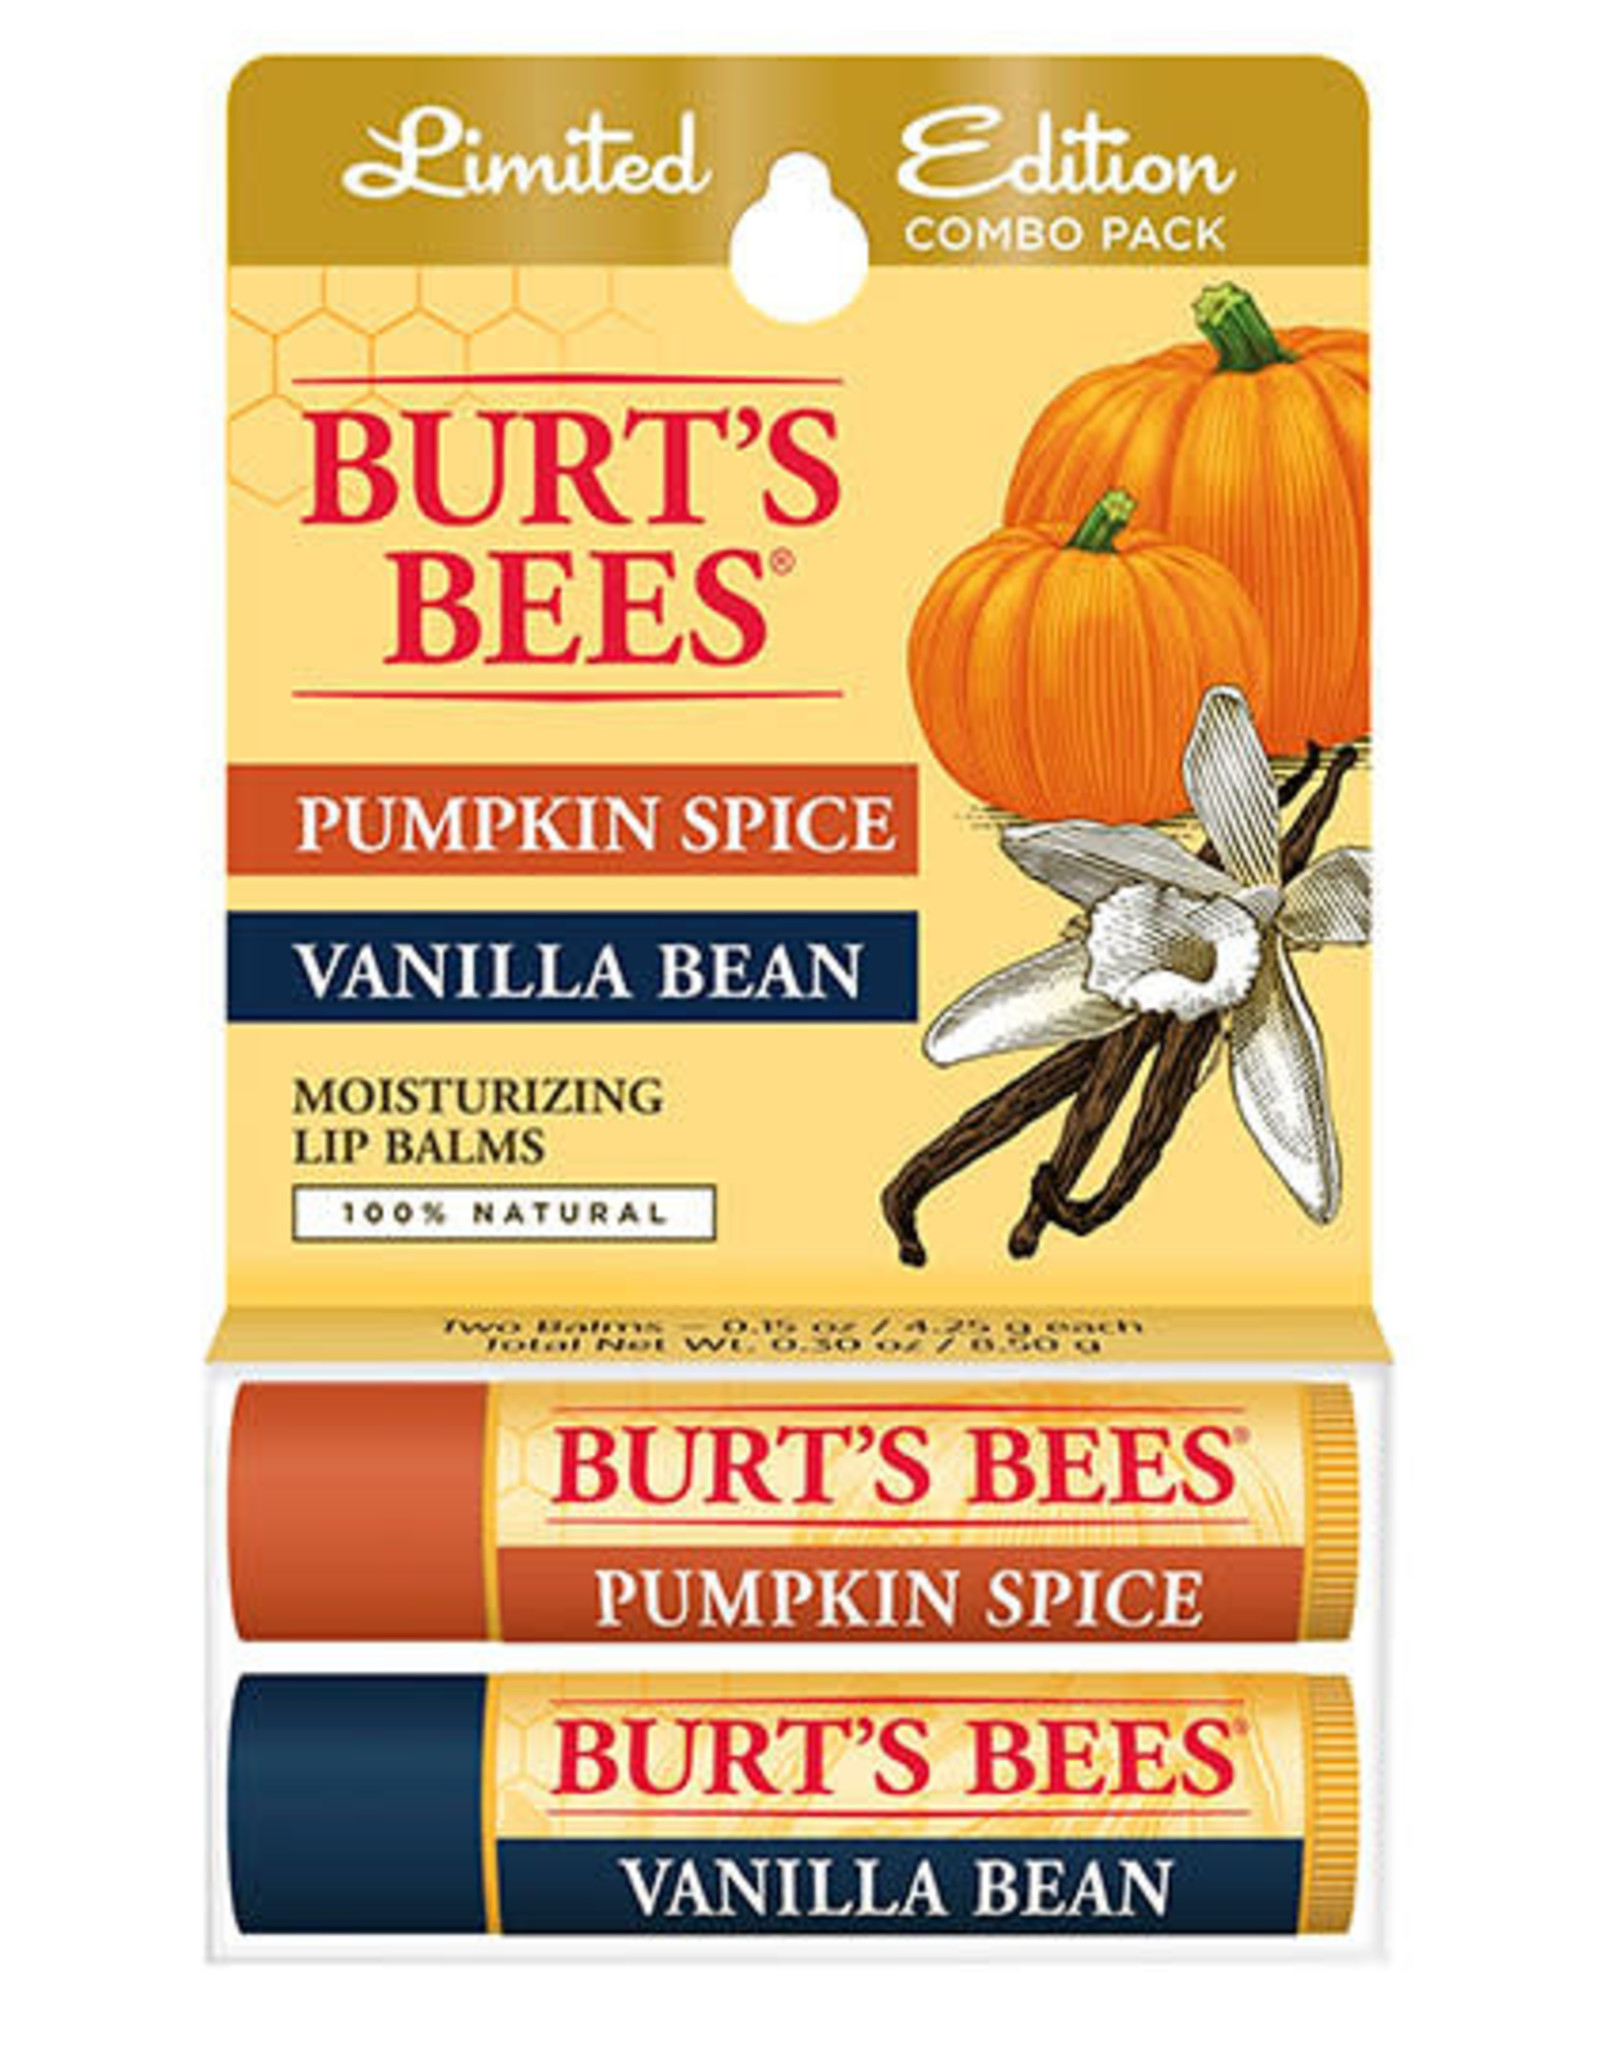 Burt's Bees Pumpkin Spice & Vanilla Bean Lip Balm 2-pack